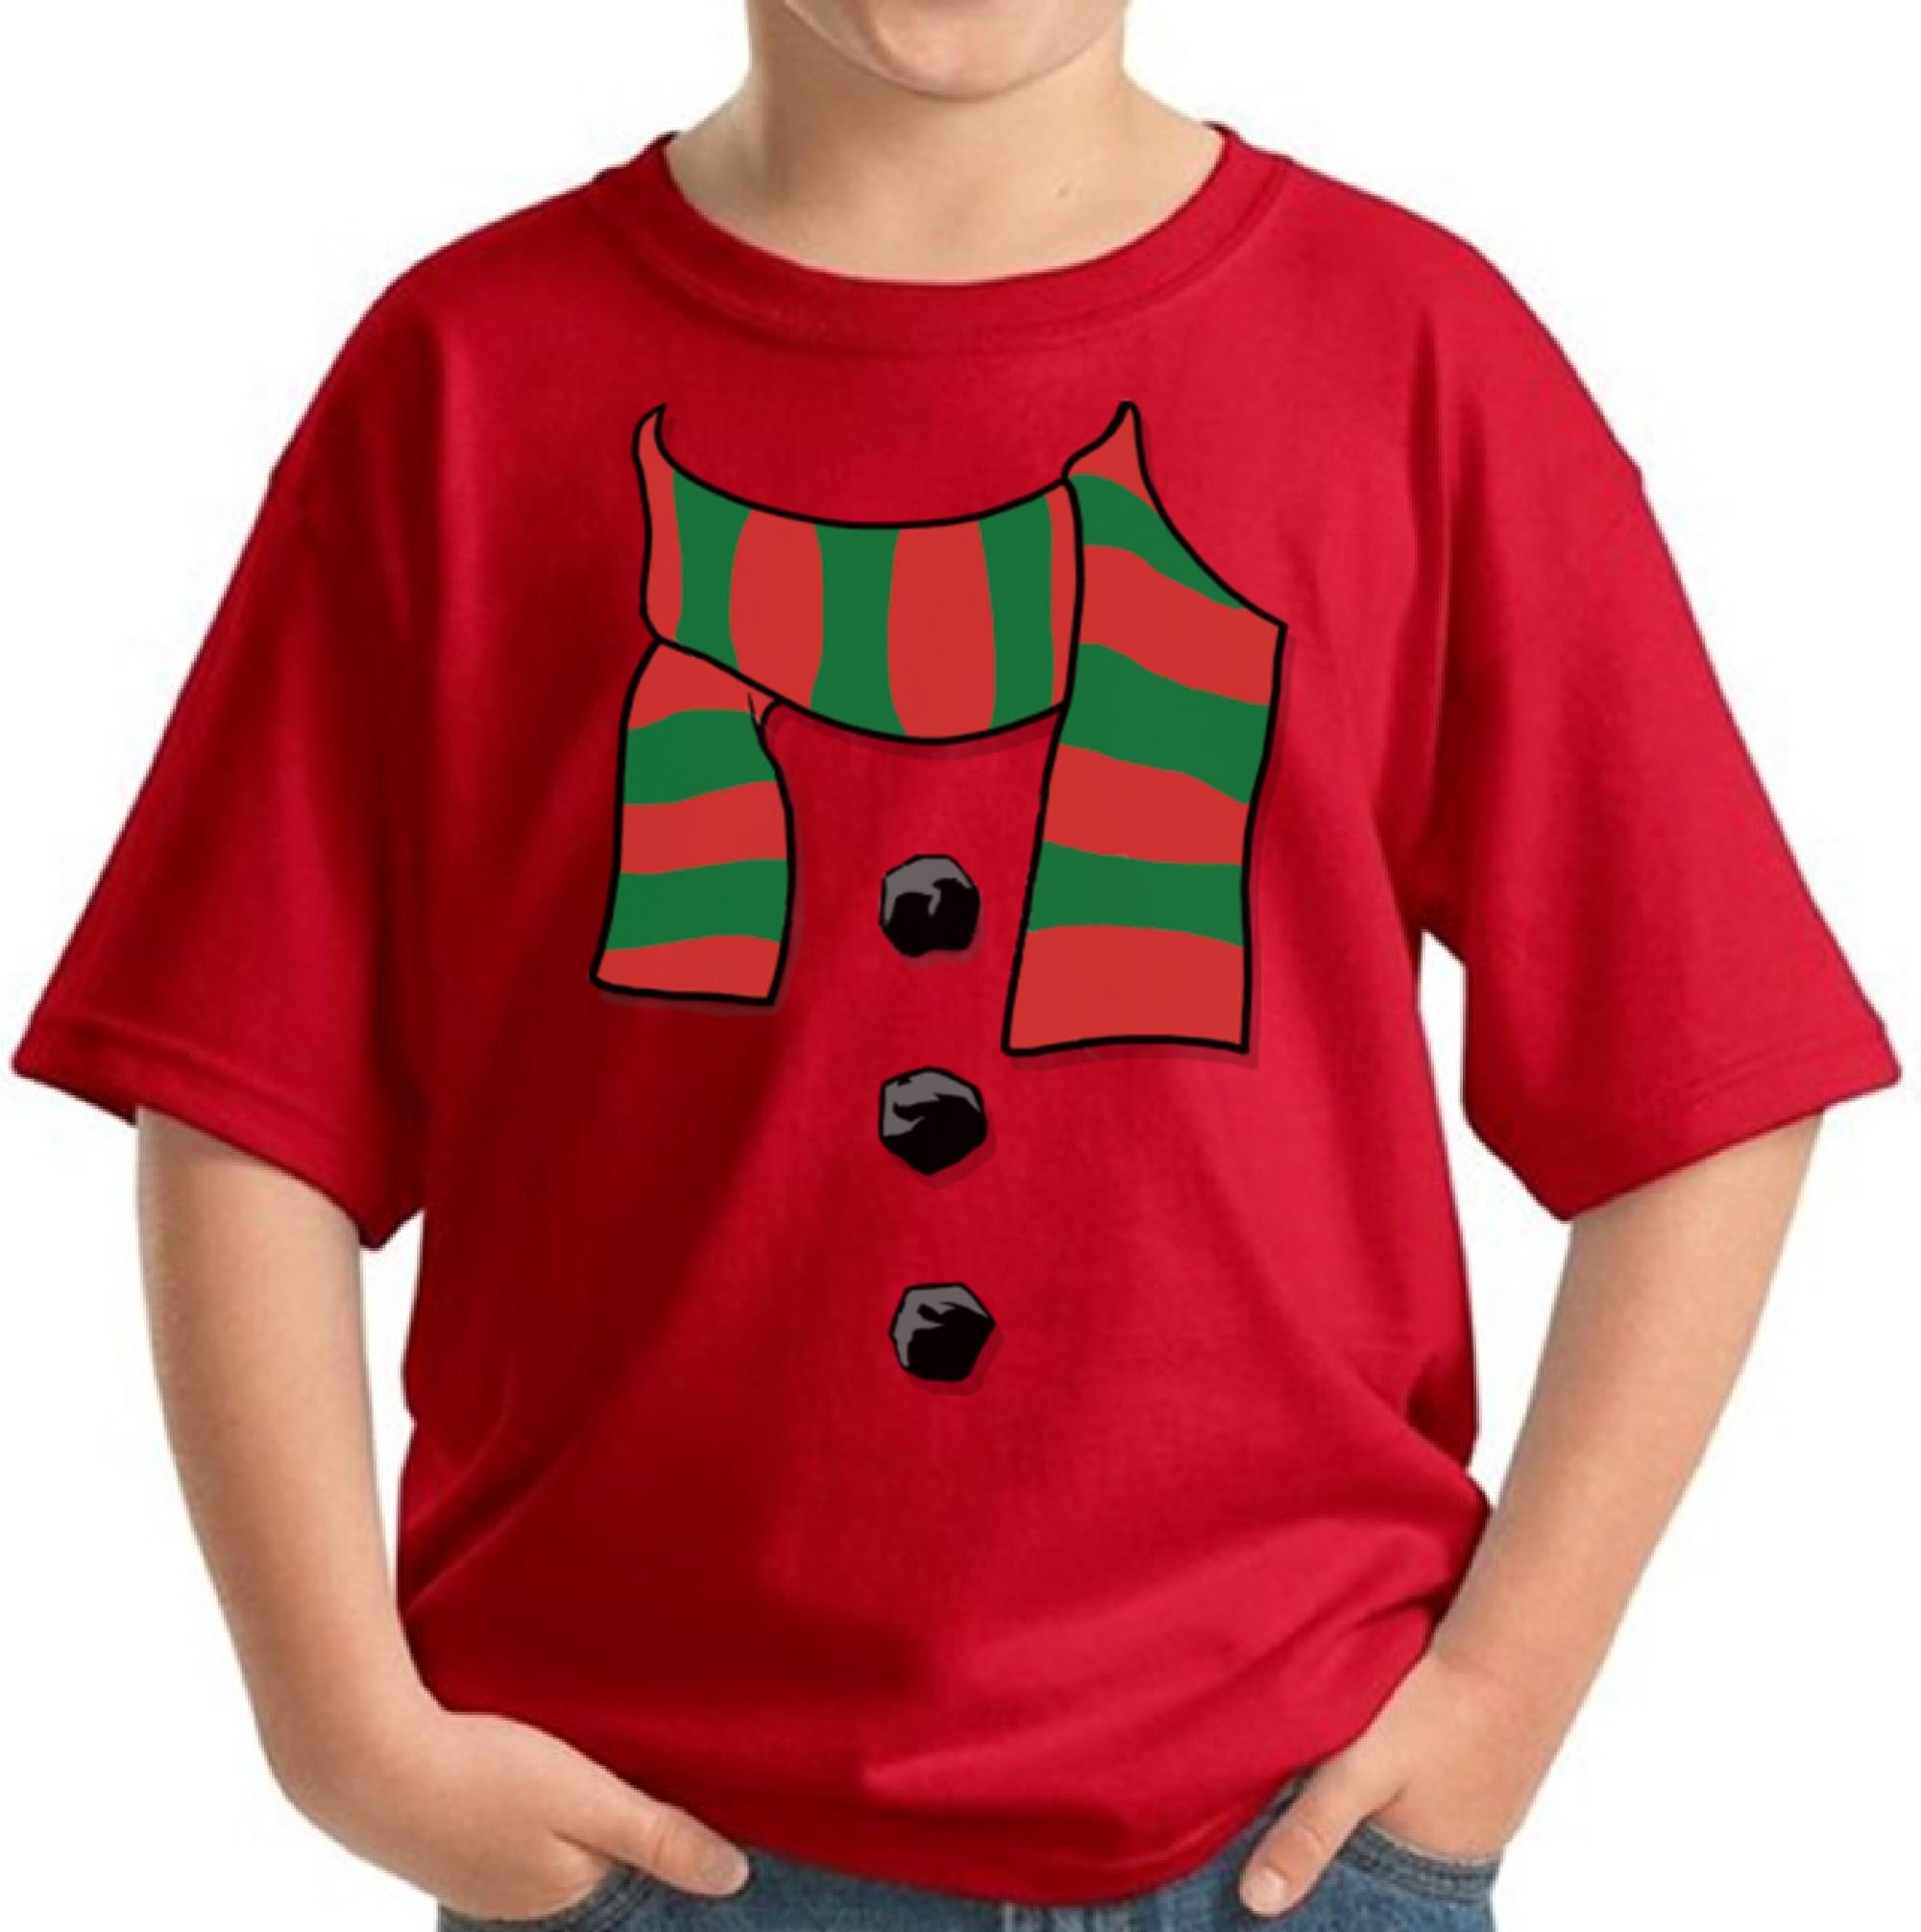 Snowman Scarf Christmas Shirts for Kids Christmas Costume Youth ...